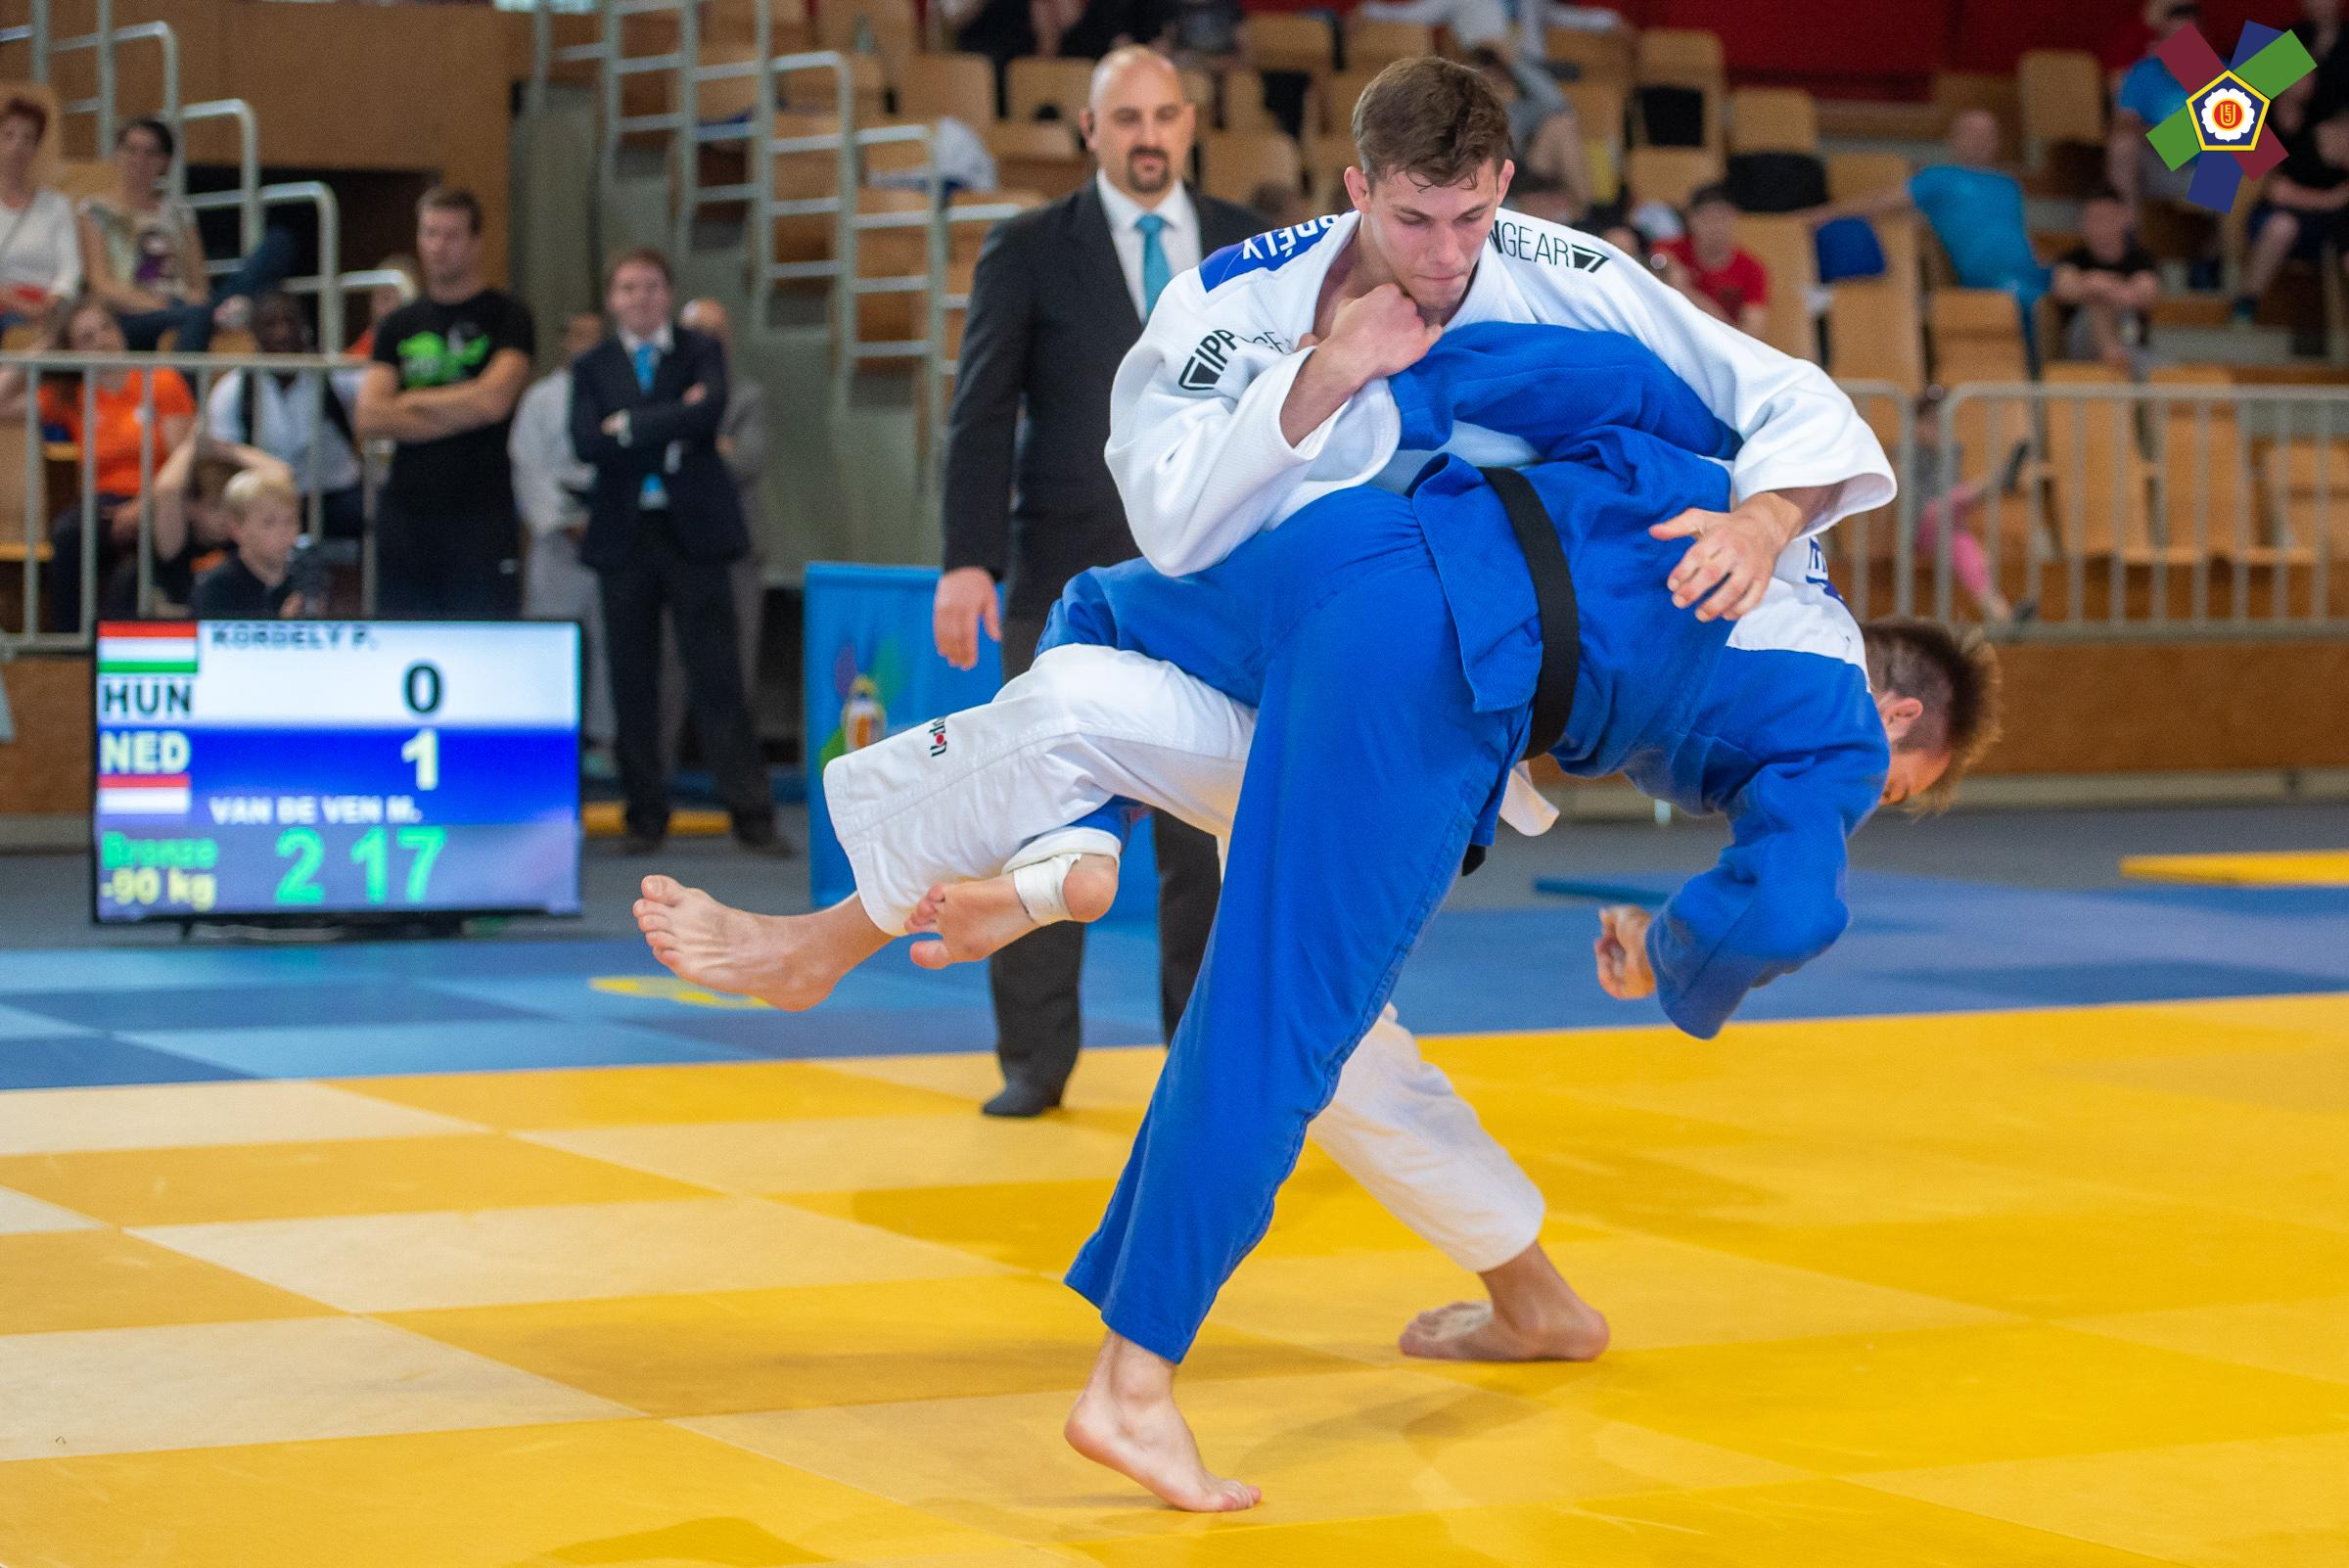 Judo-European-cup-Celje-2019-KORDELY-Peter